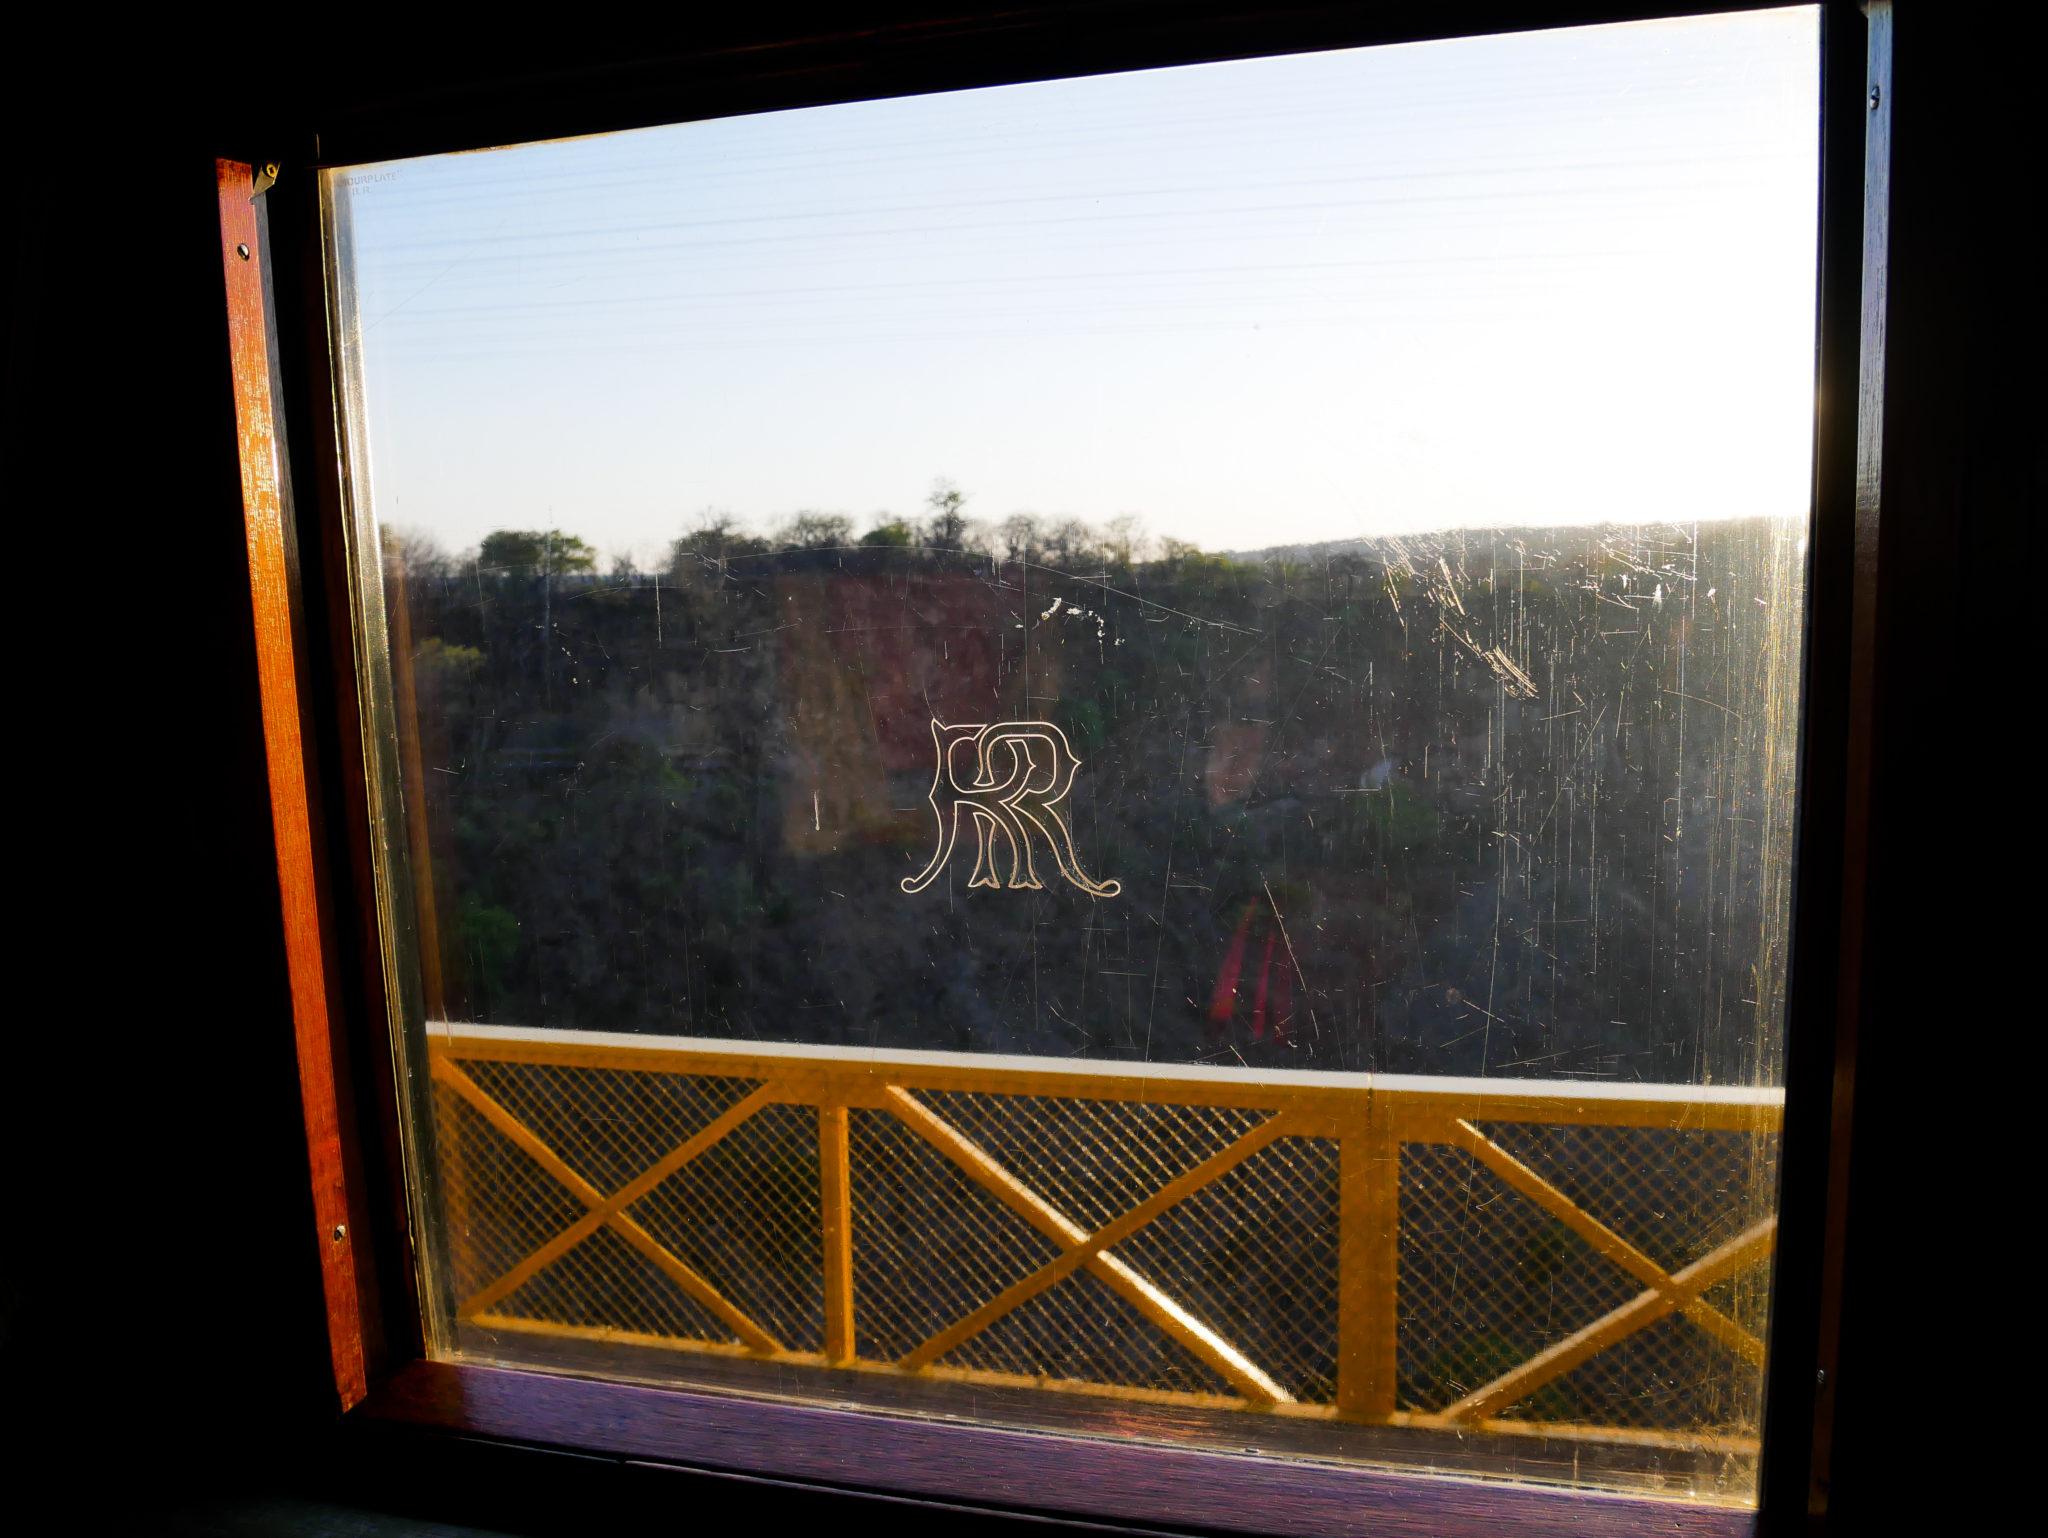 Evening sun shines through the Rovos Rail logo on the window of the Royal Livingstone Express train